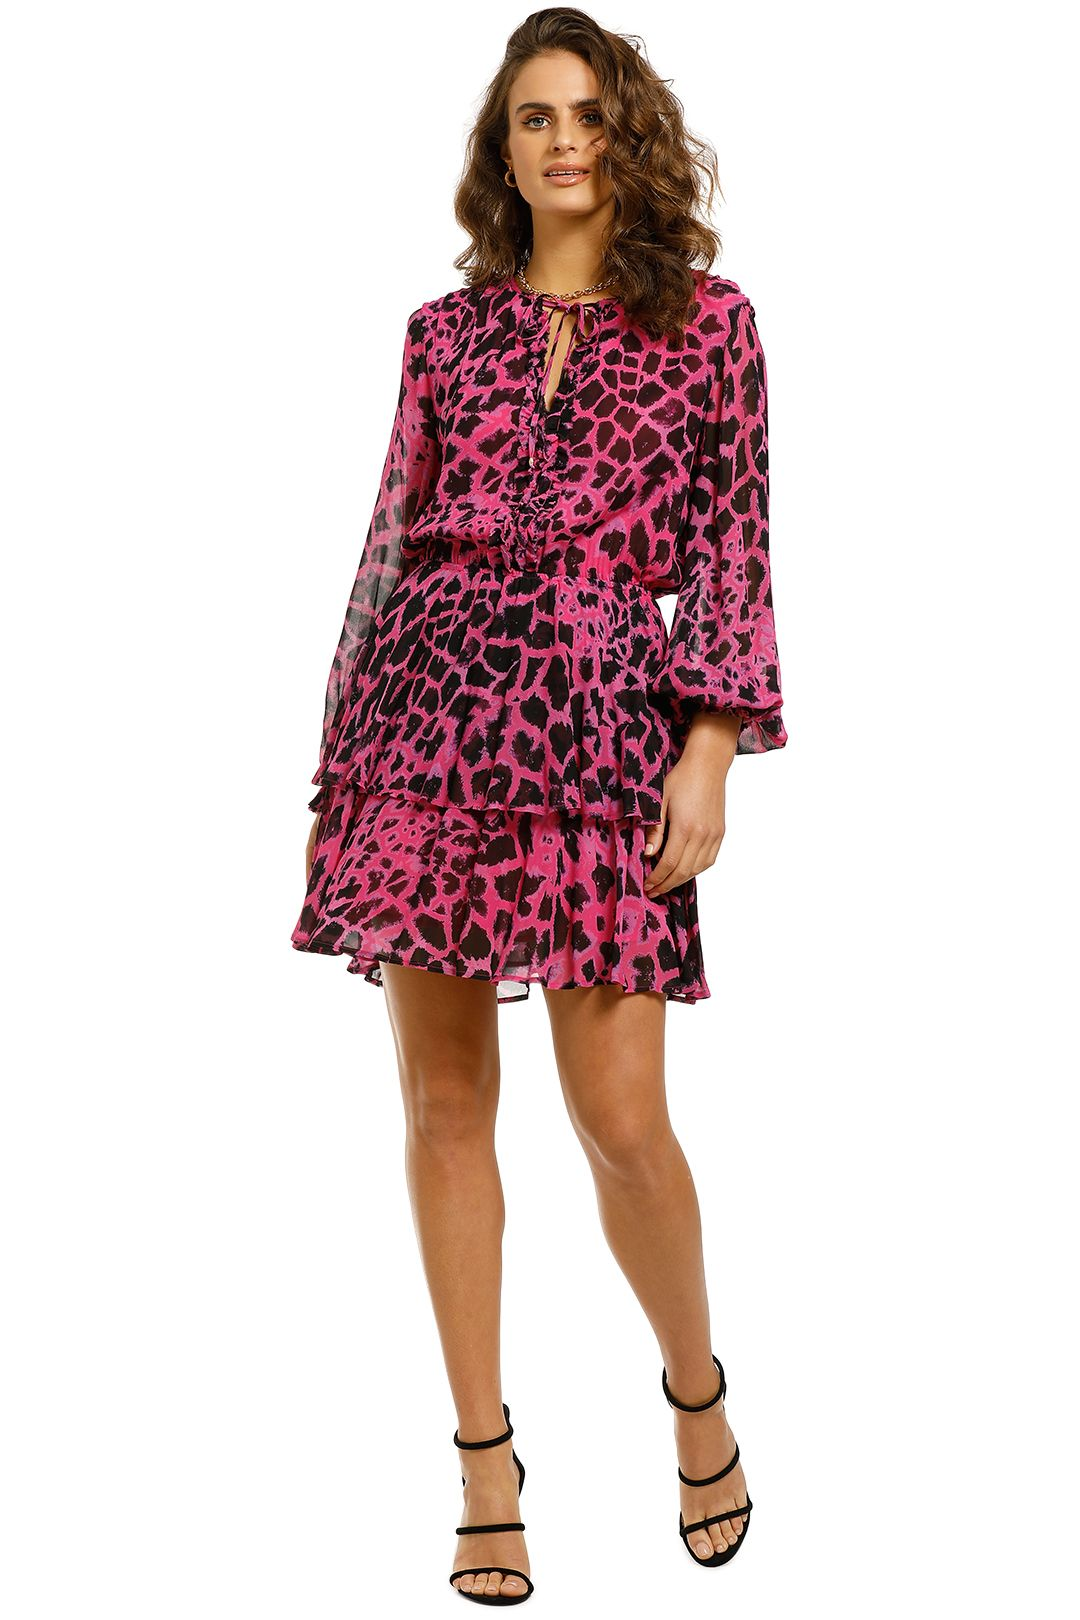 Husk-Zirafa-Dress-Pink-Giraffe-Front